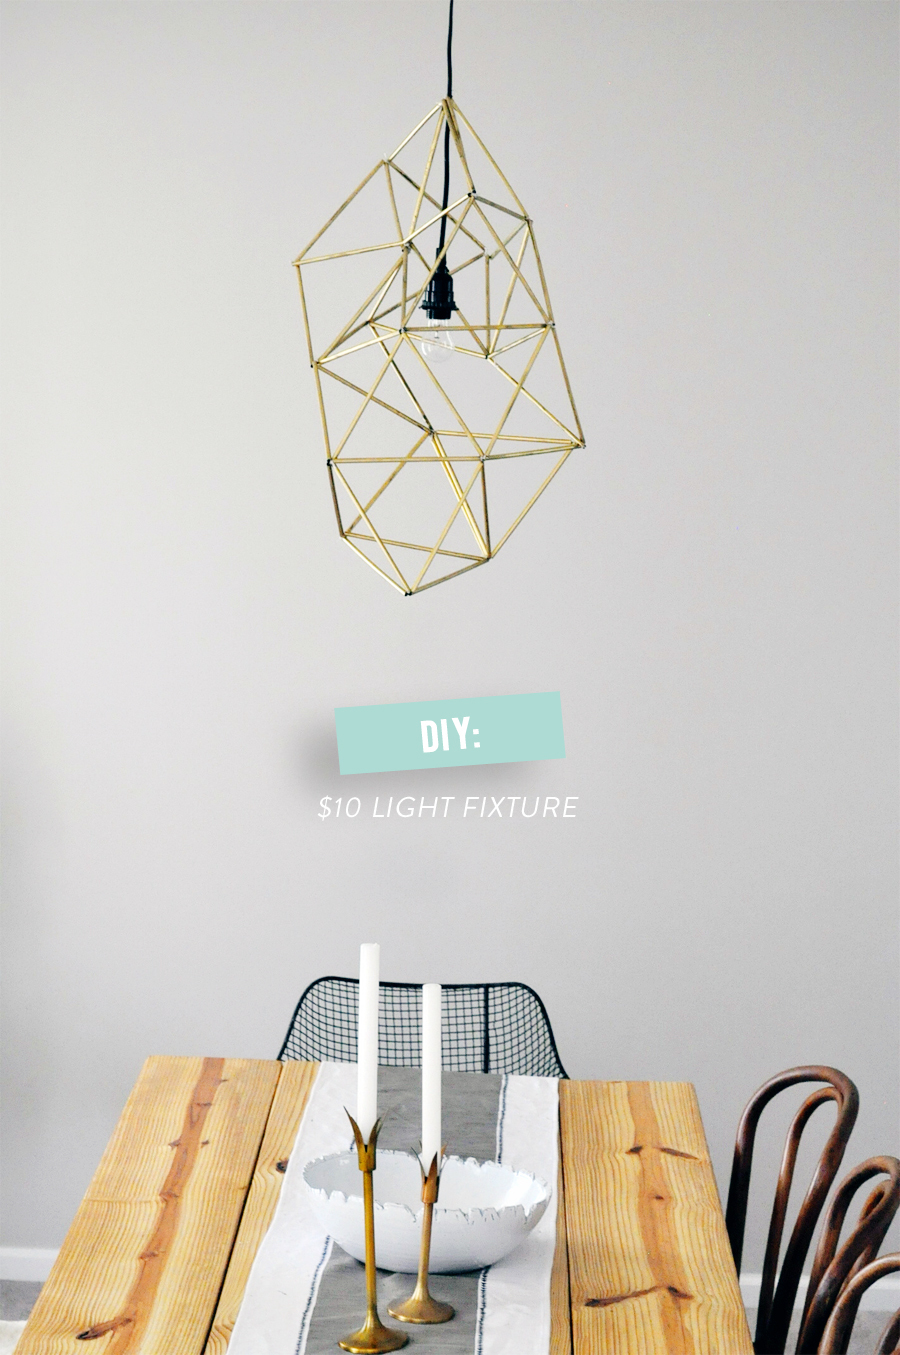 Pneumatic addict 30 diy modern lighting ideas for Dodecahedron light fixture